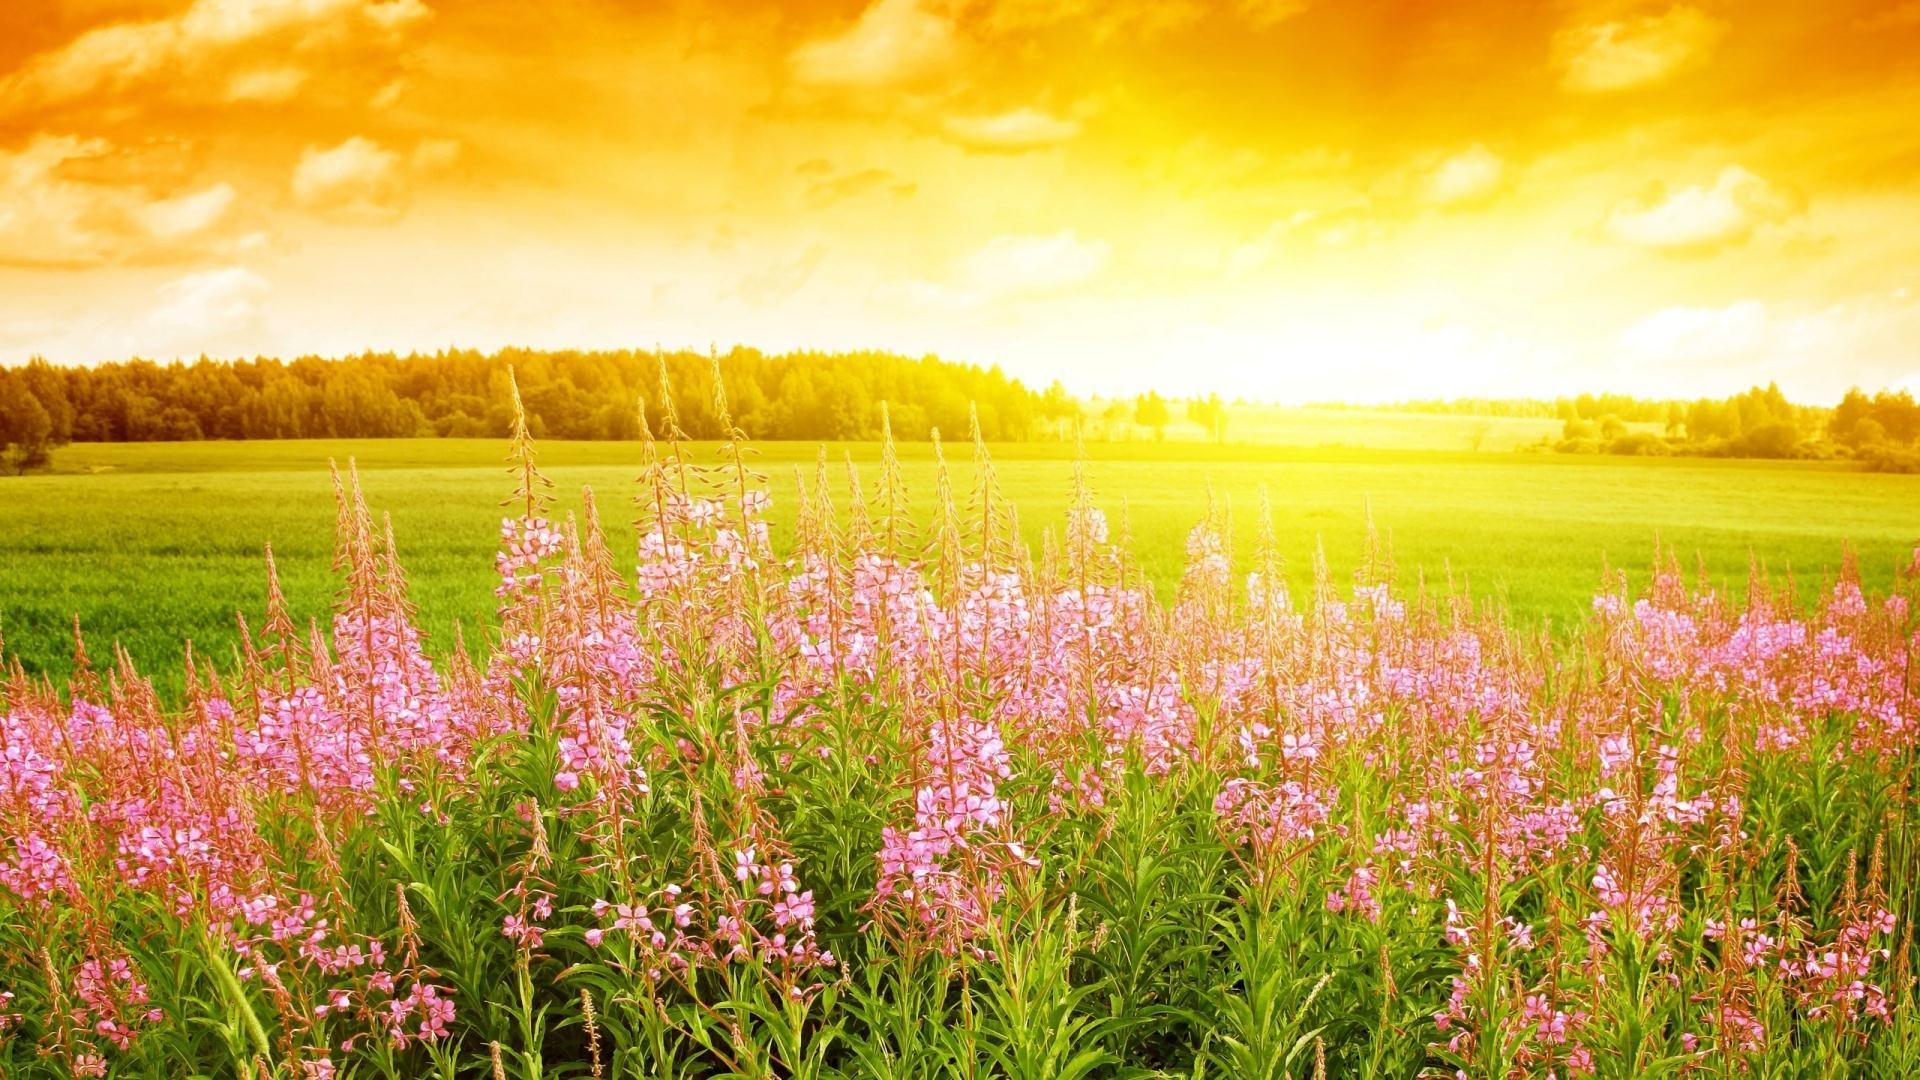 Sun Bright Nature Flowers Scenery Summer Wallpaper Field Wallpaper Sunrise Wallpaper